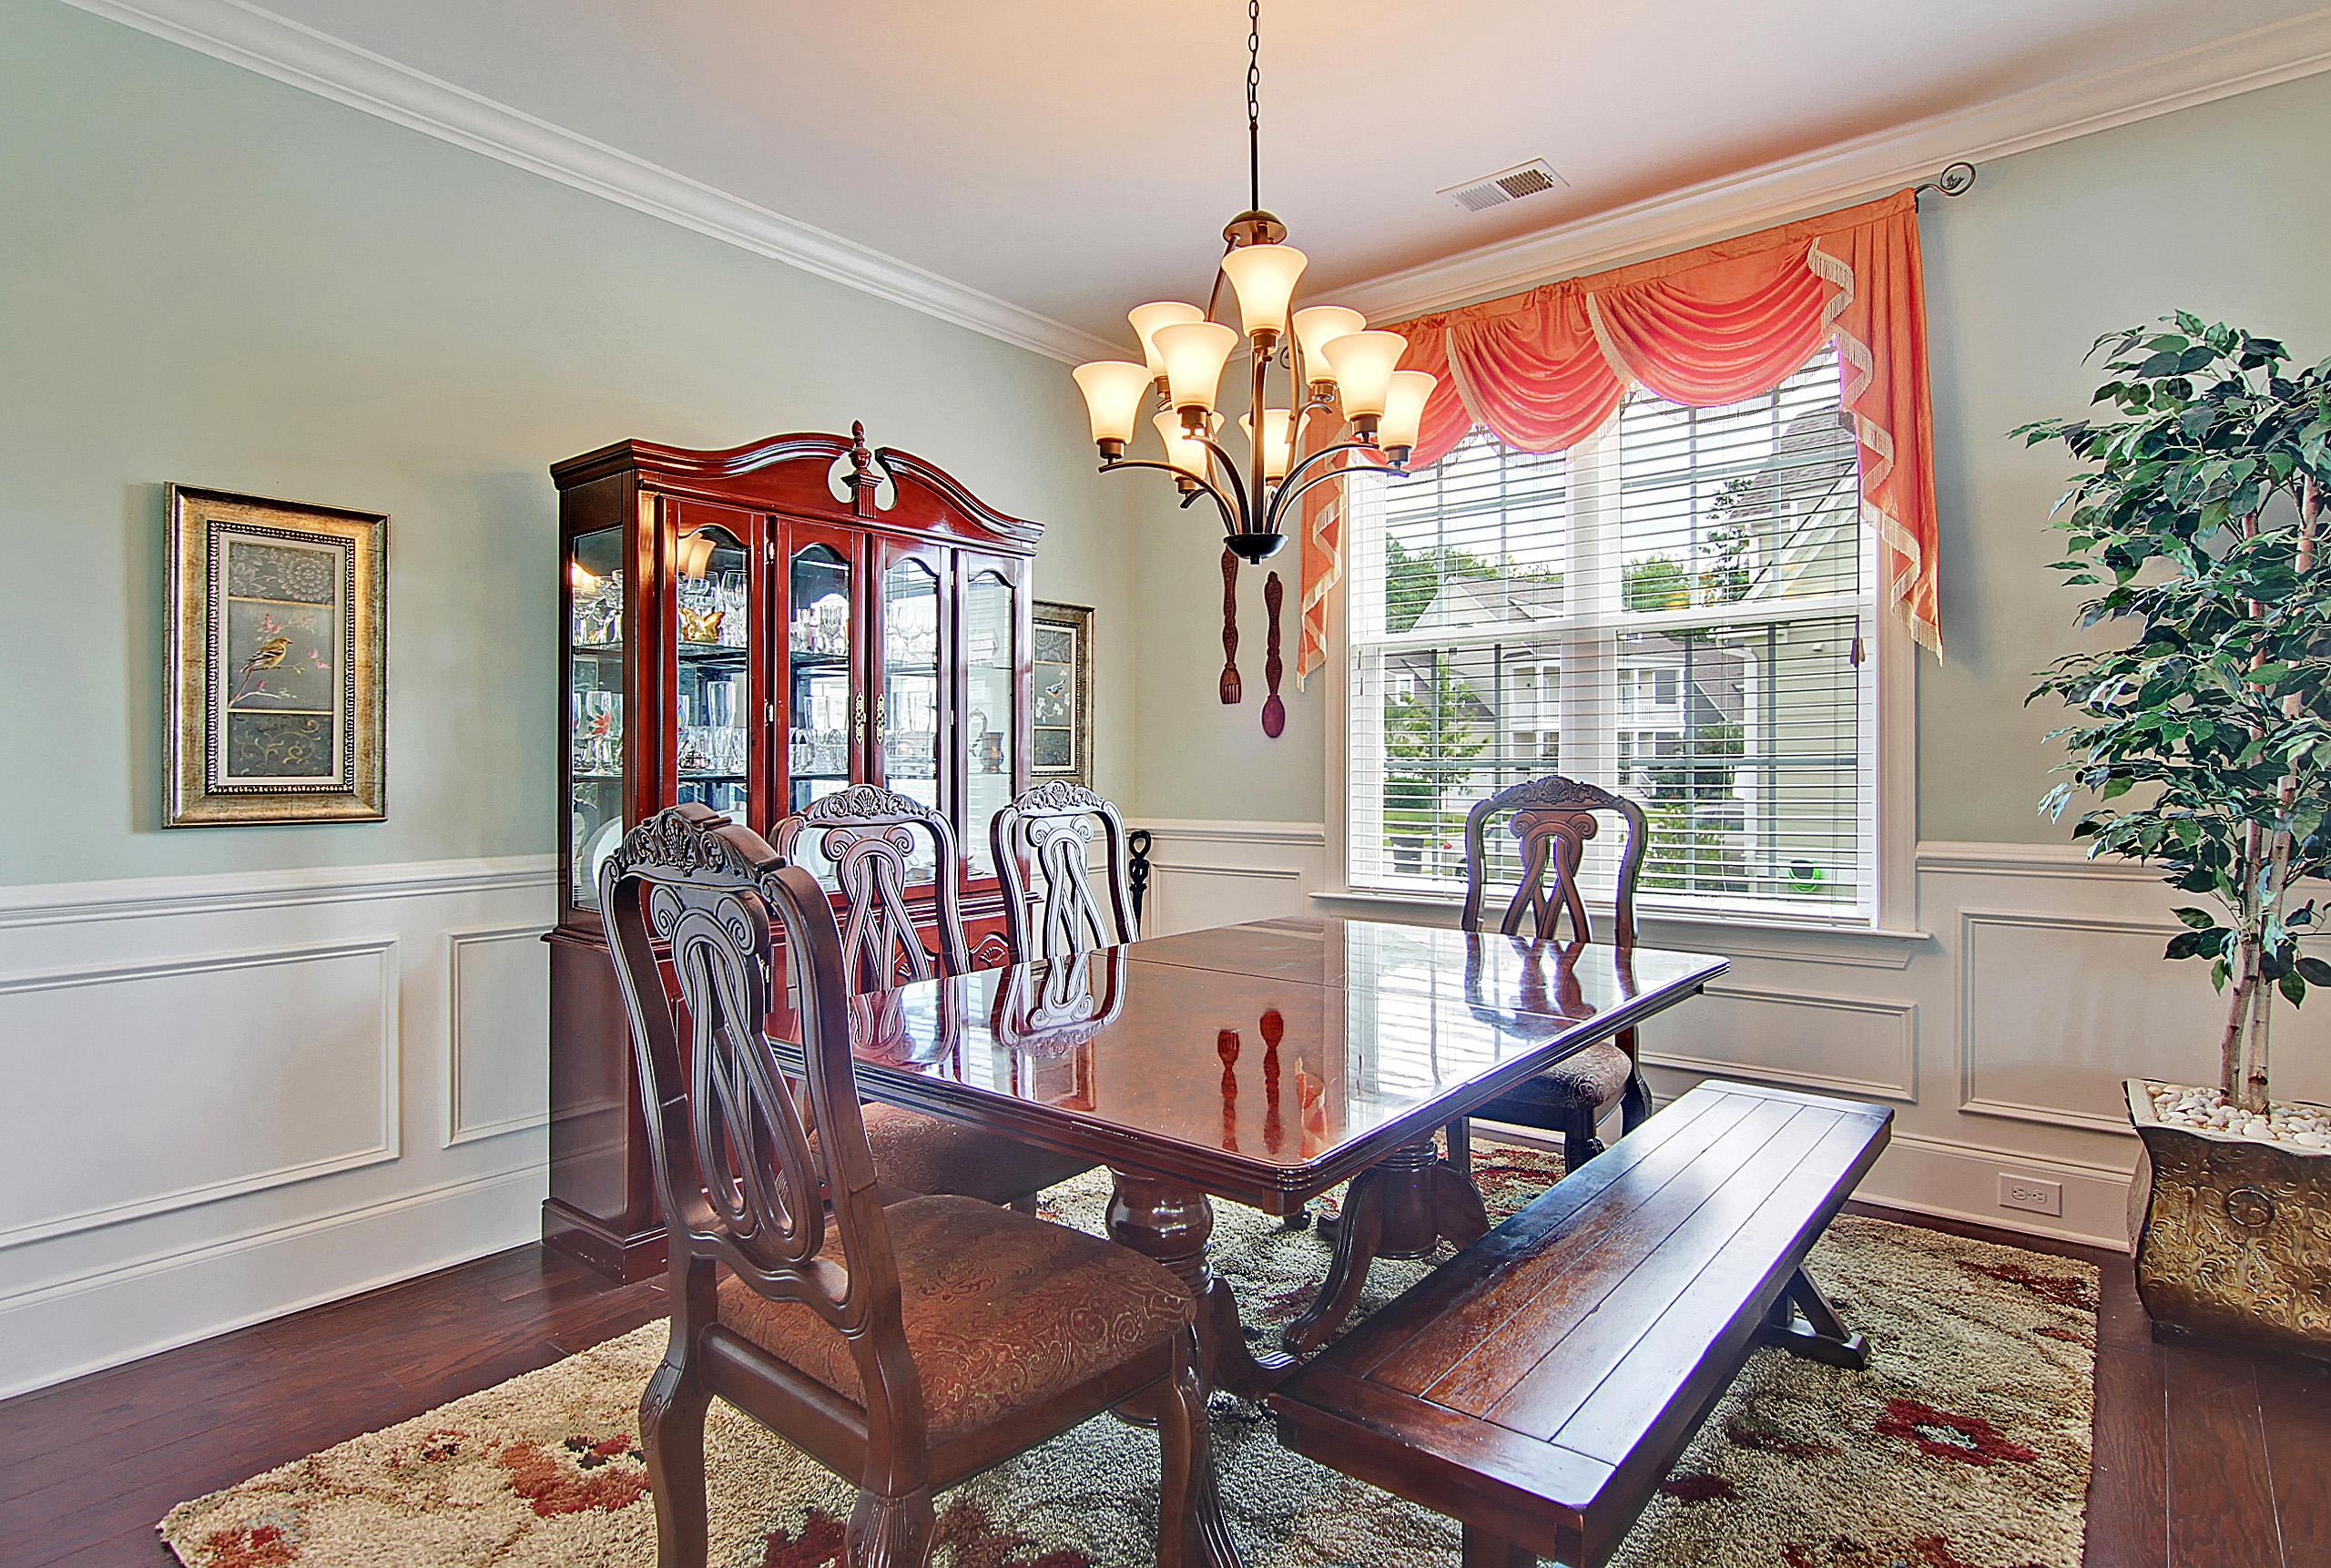 Dunes West Homes For Sale - 1332 Whisker Pole, Mount Pleasant, SC - 10